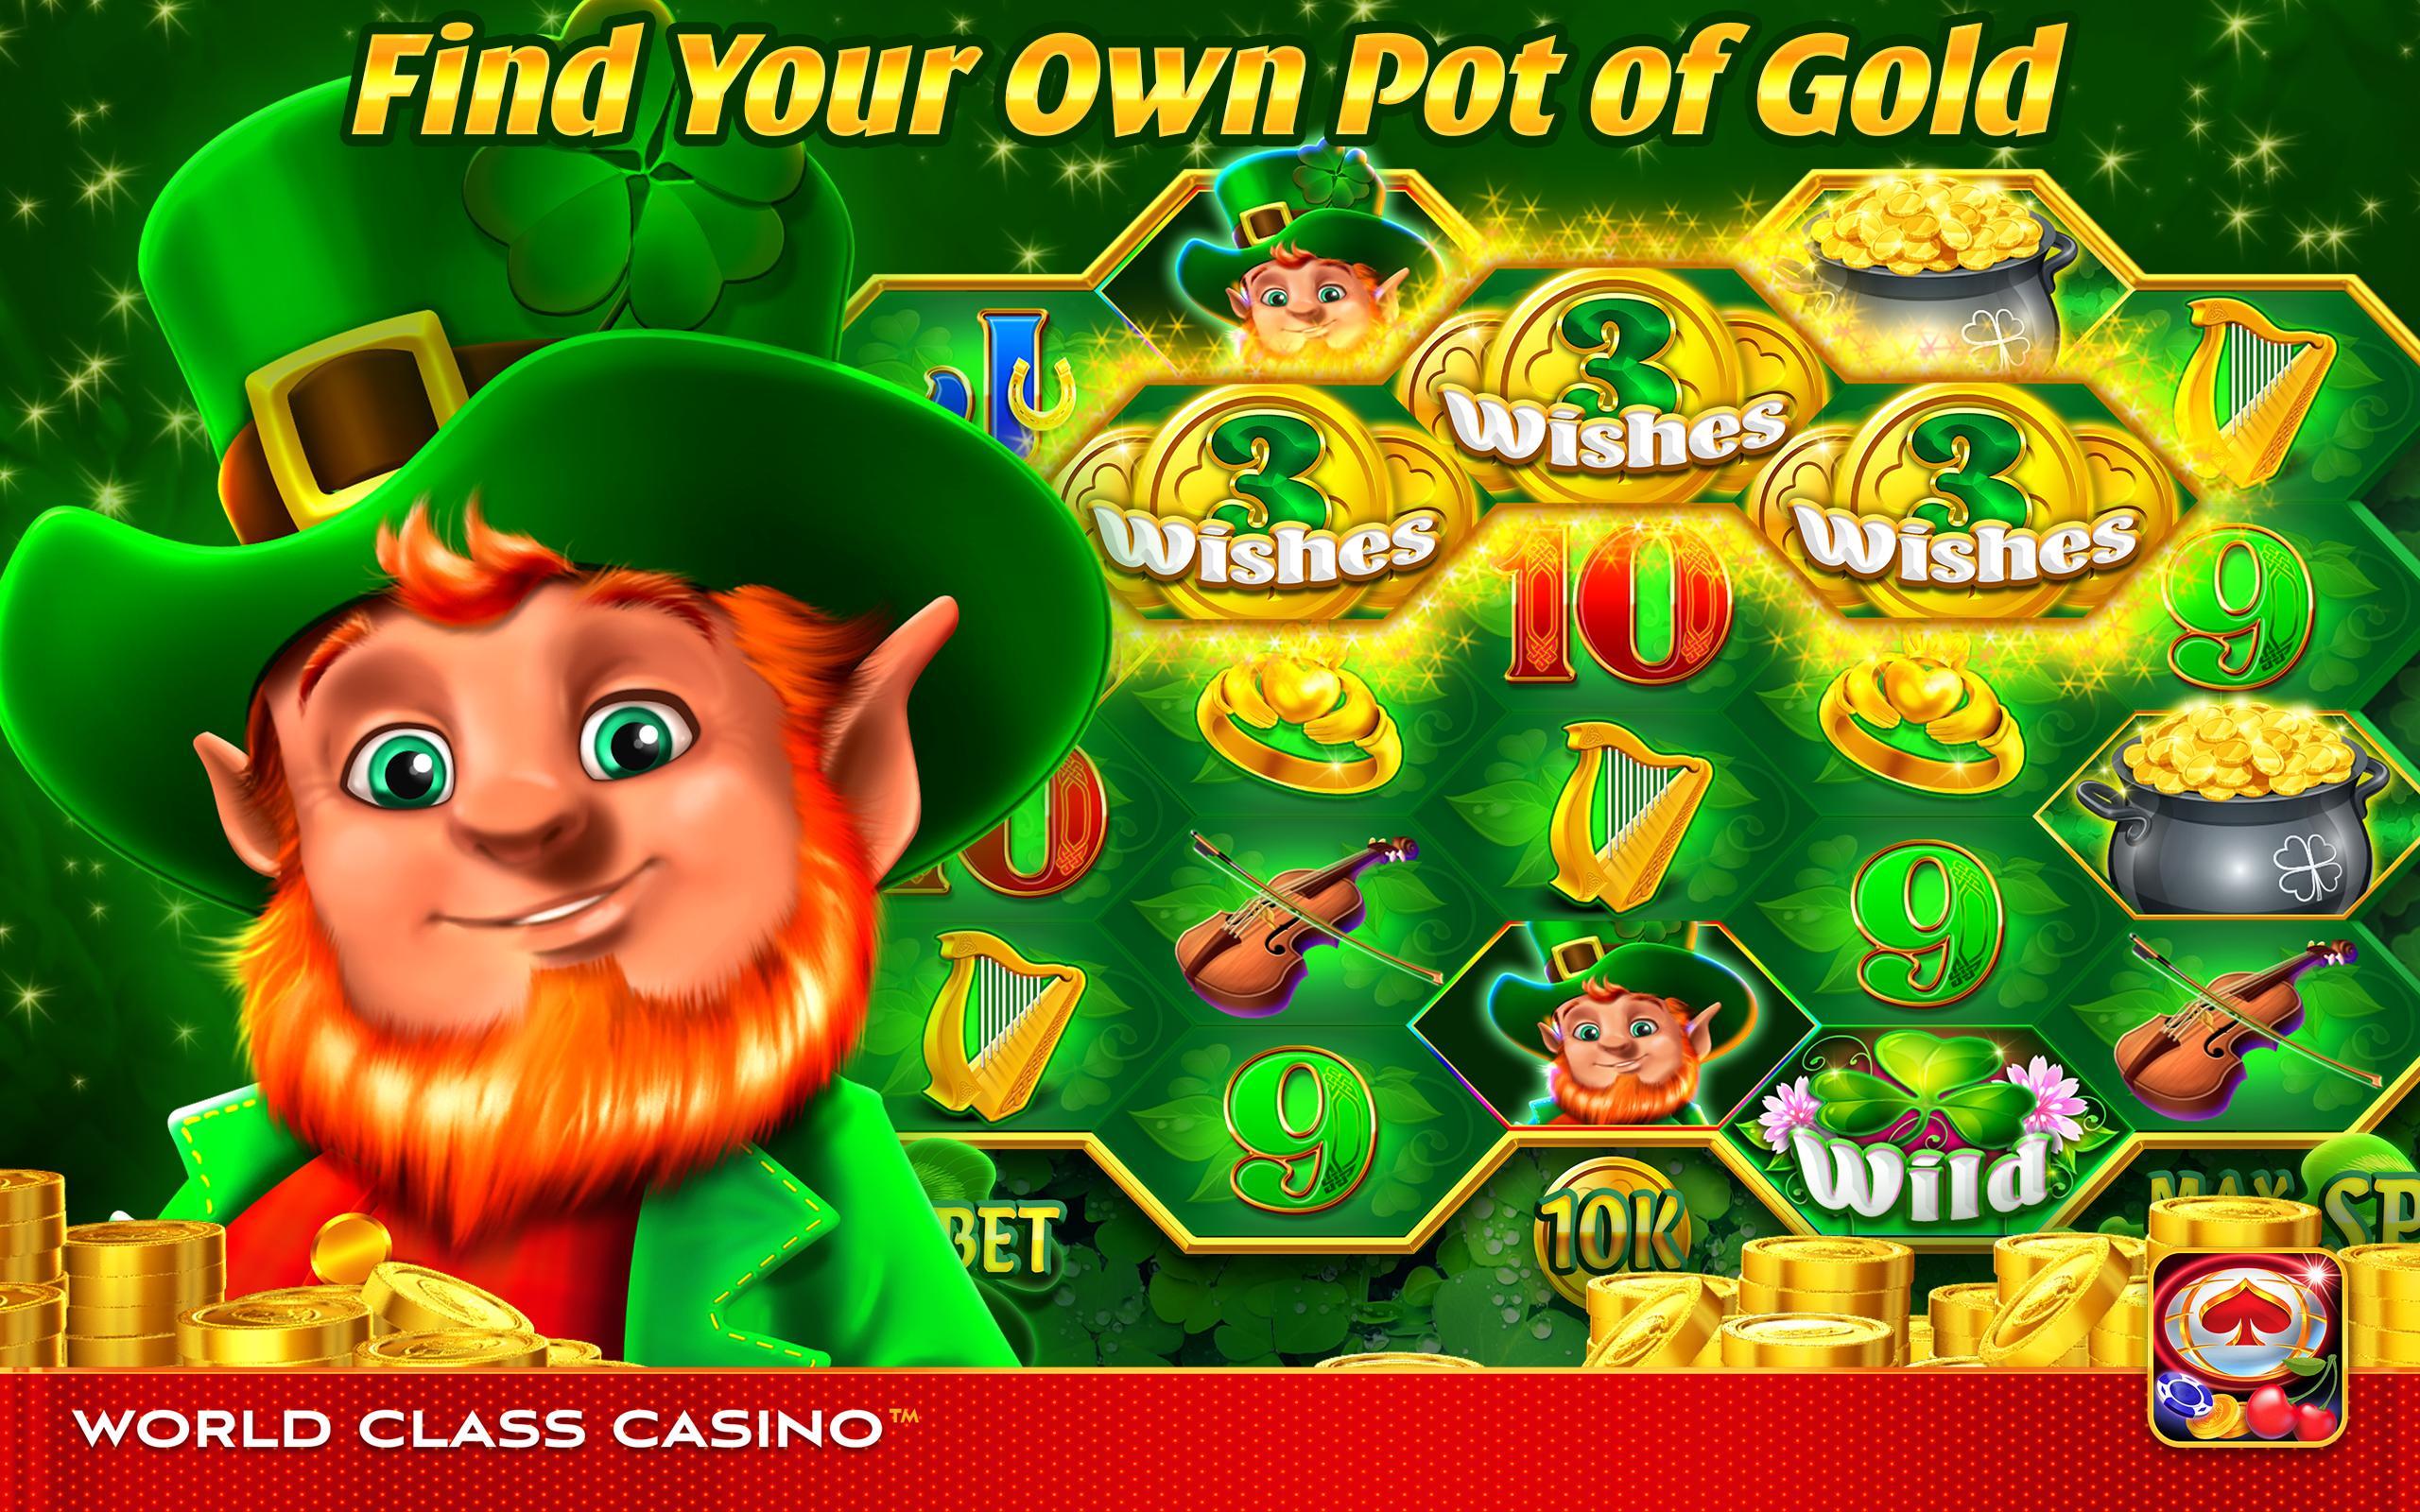 World Class Casino Slots, Blackjack & Poker Room 8.0.4 Screenshot 23